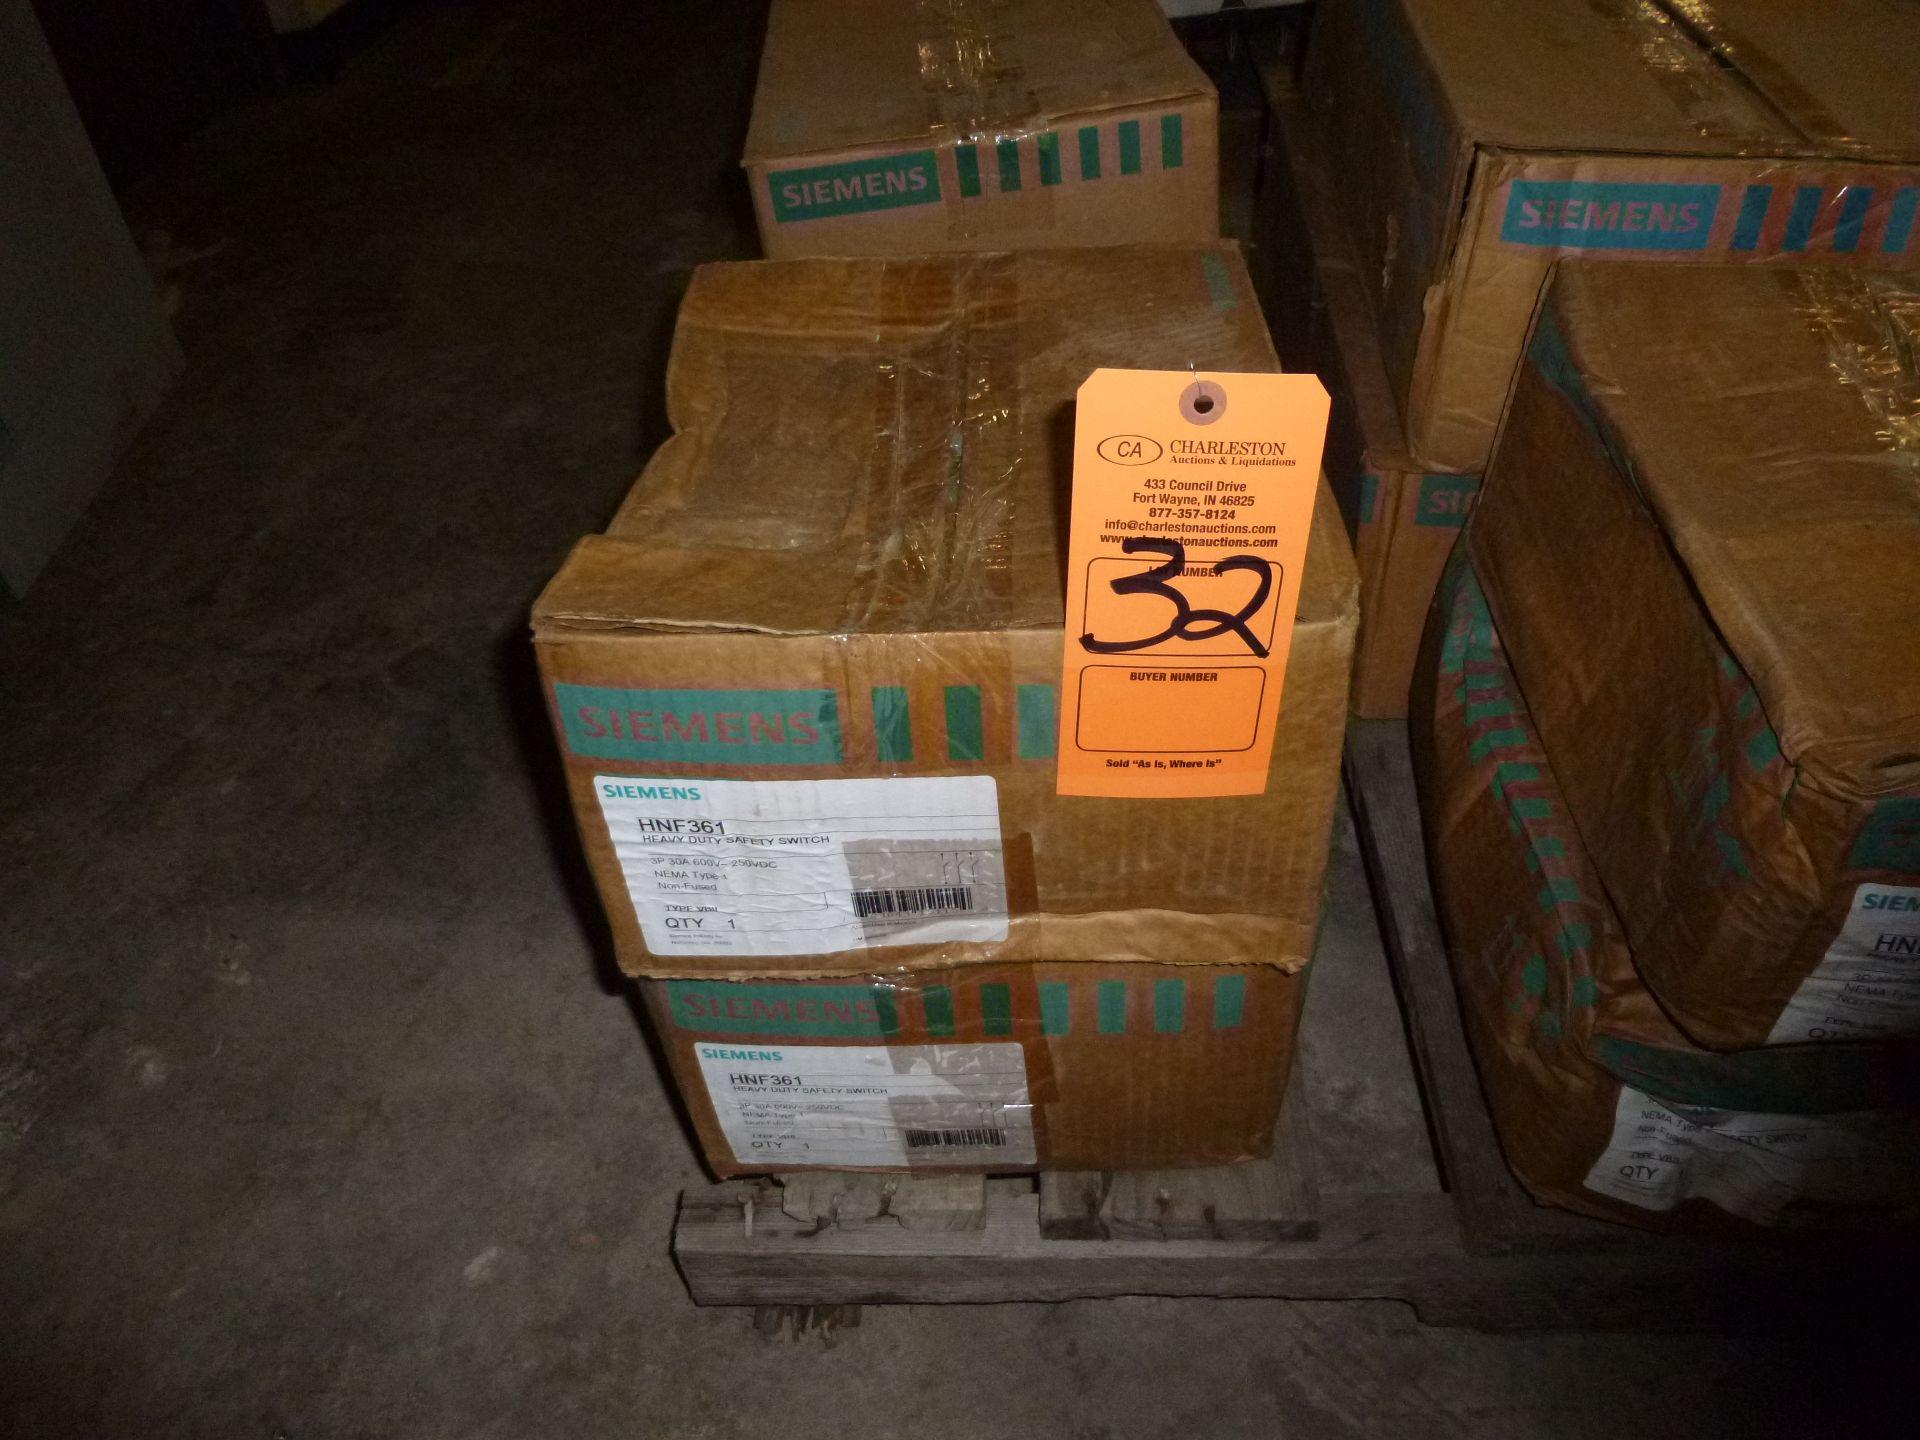 Lot 32 - Qty 2 Siemens model HNF361, heavy duty safety switch, new in box